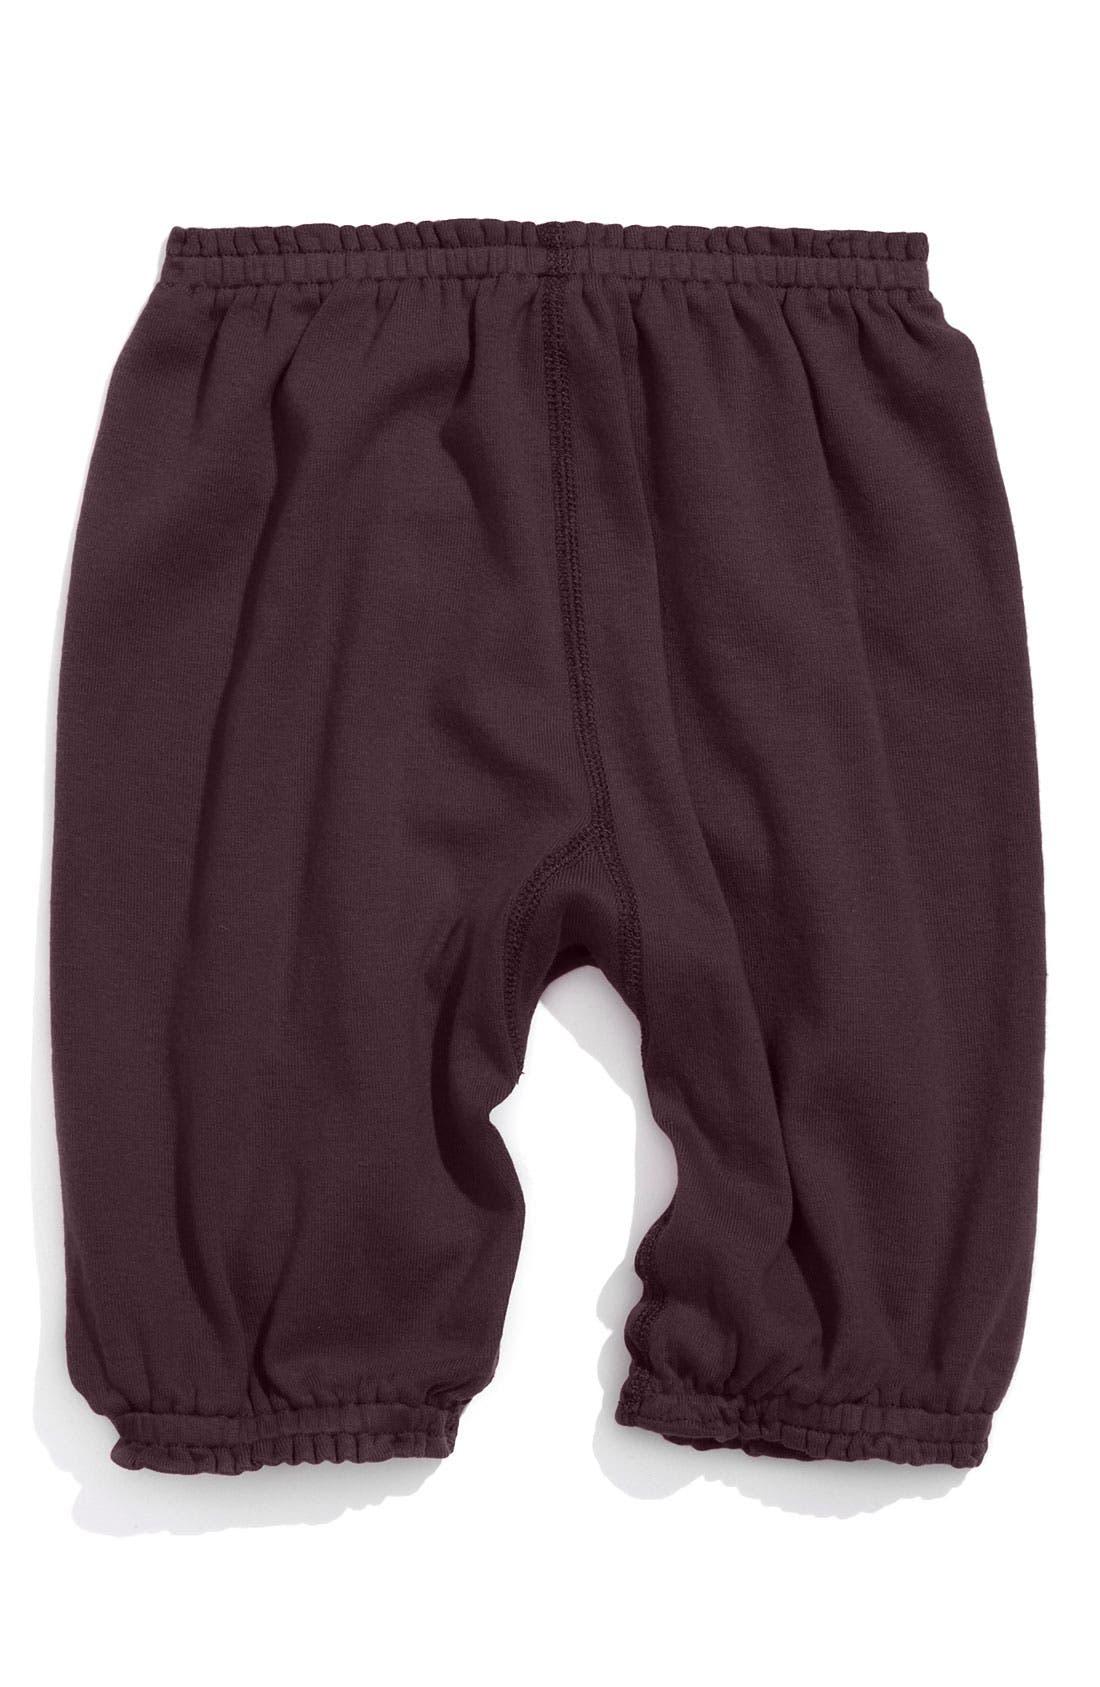 Alternate Image 1 Selected - Peek 'Little Peanut' Happy Pants (Infant)